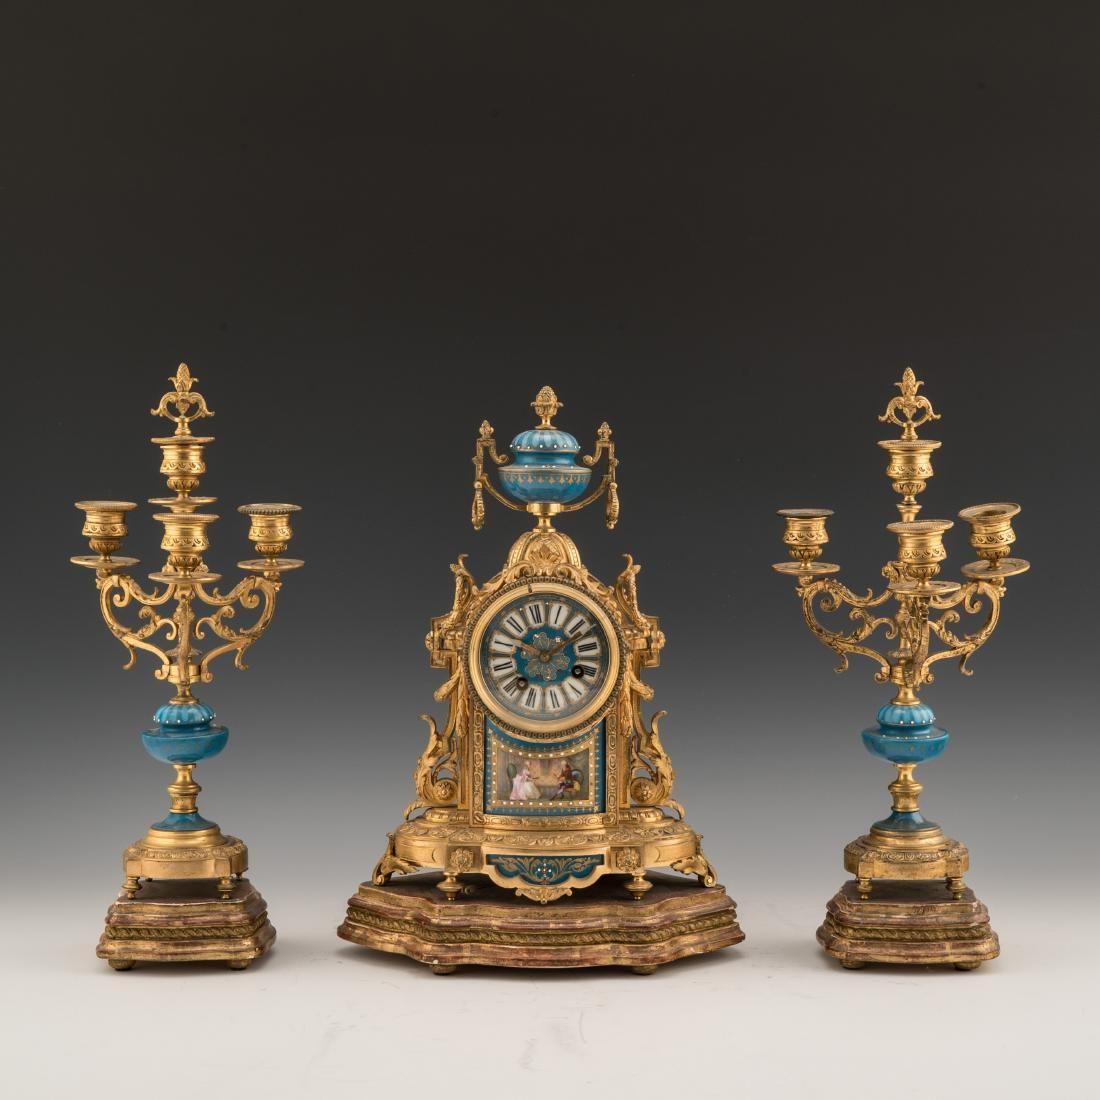 FRENCH GILT BRONZE AND PORCELAIN CLOCK GARNITURE